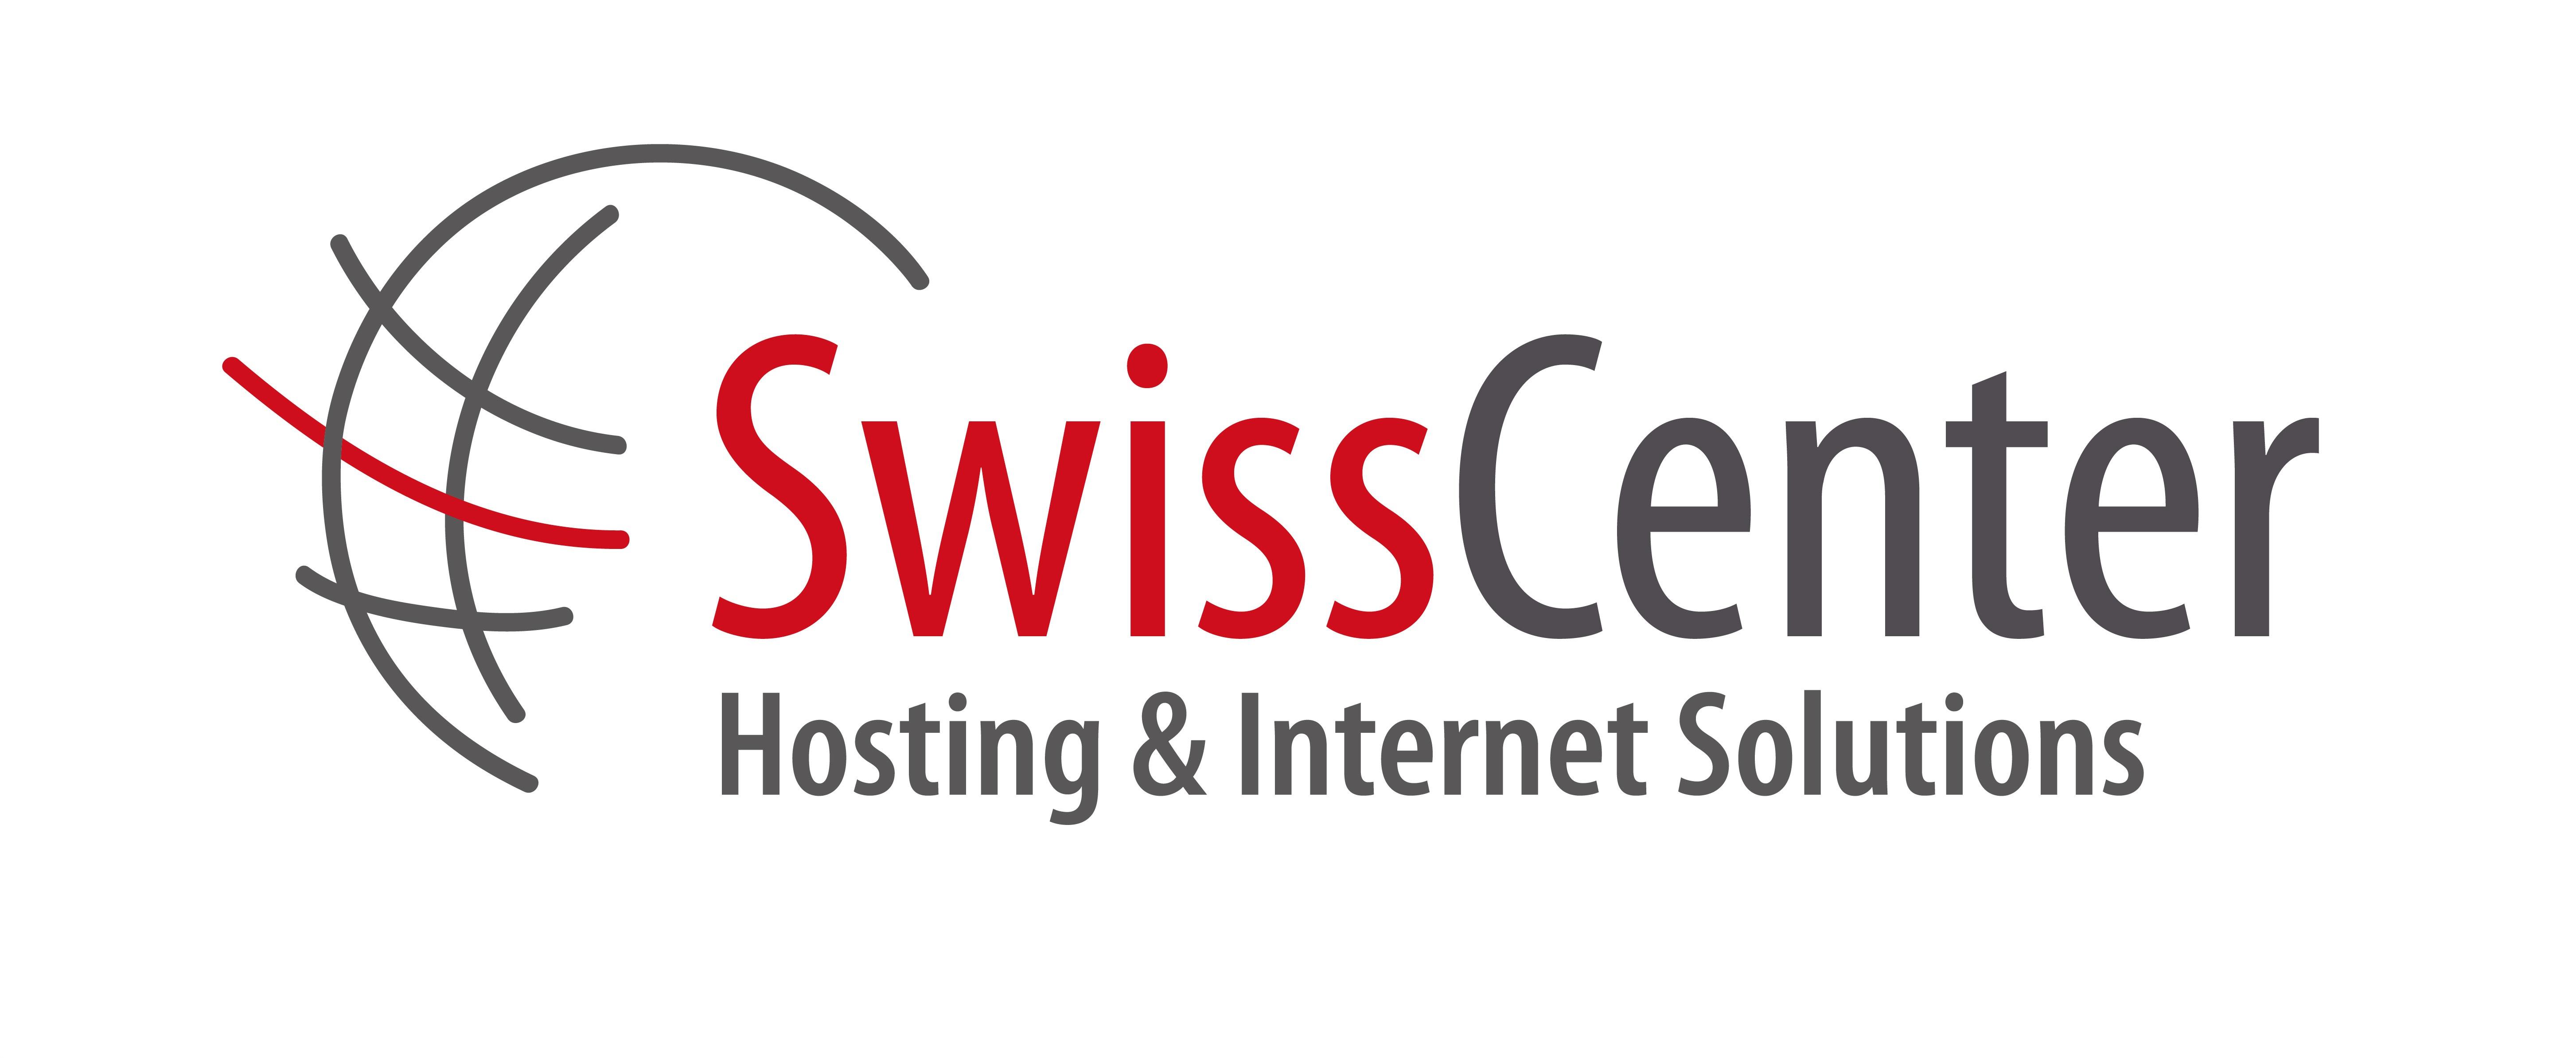 www.swisscenter.com